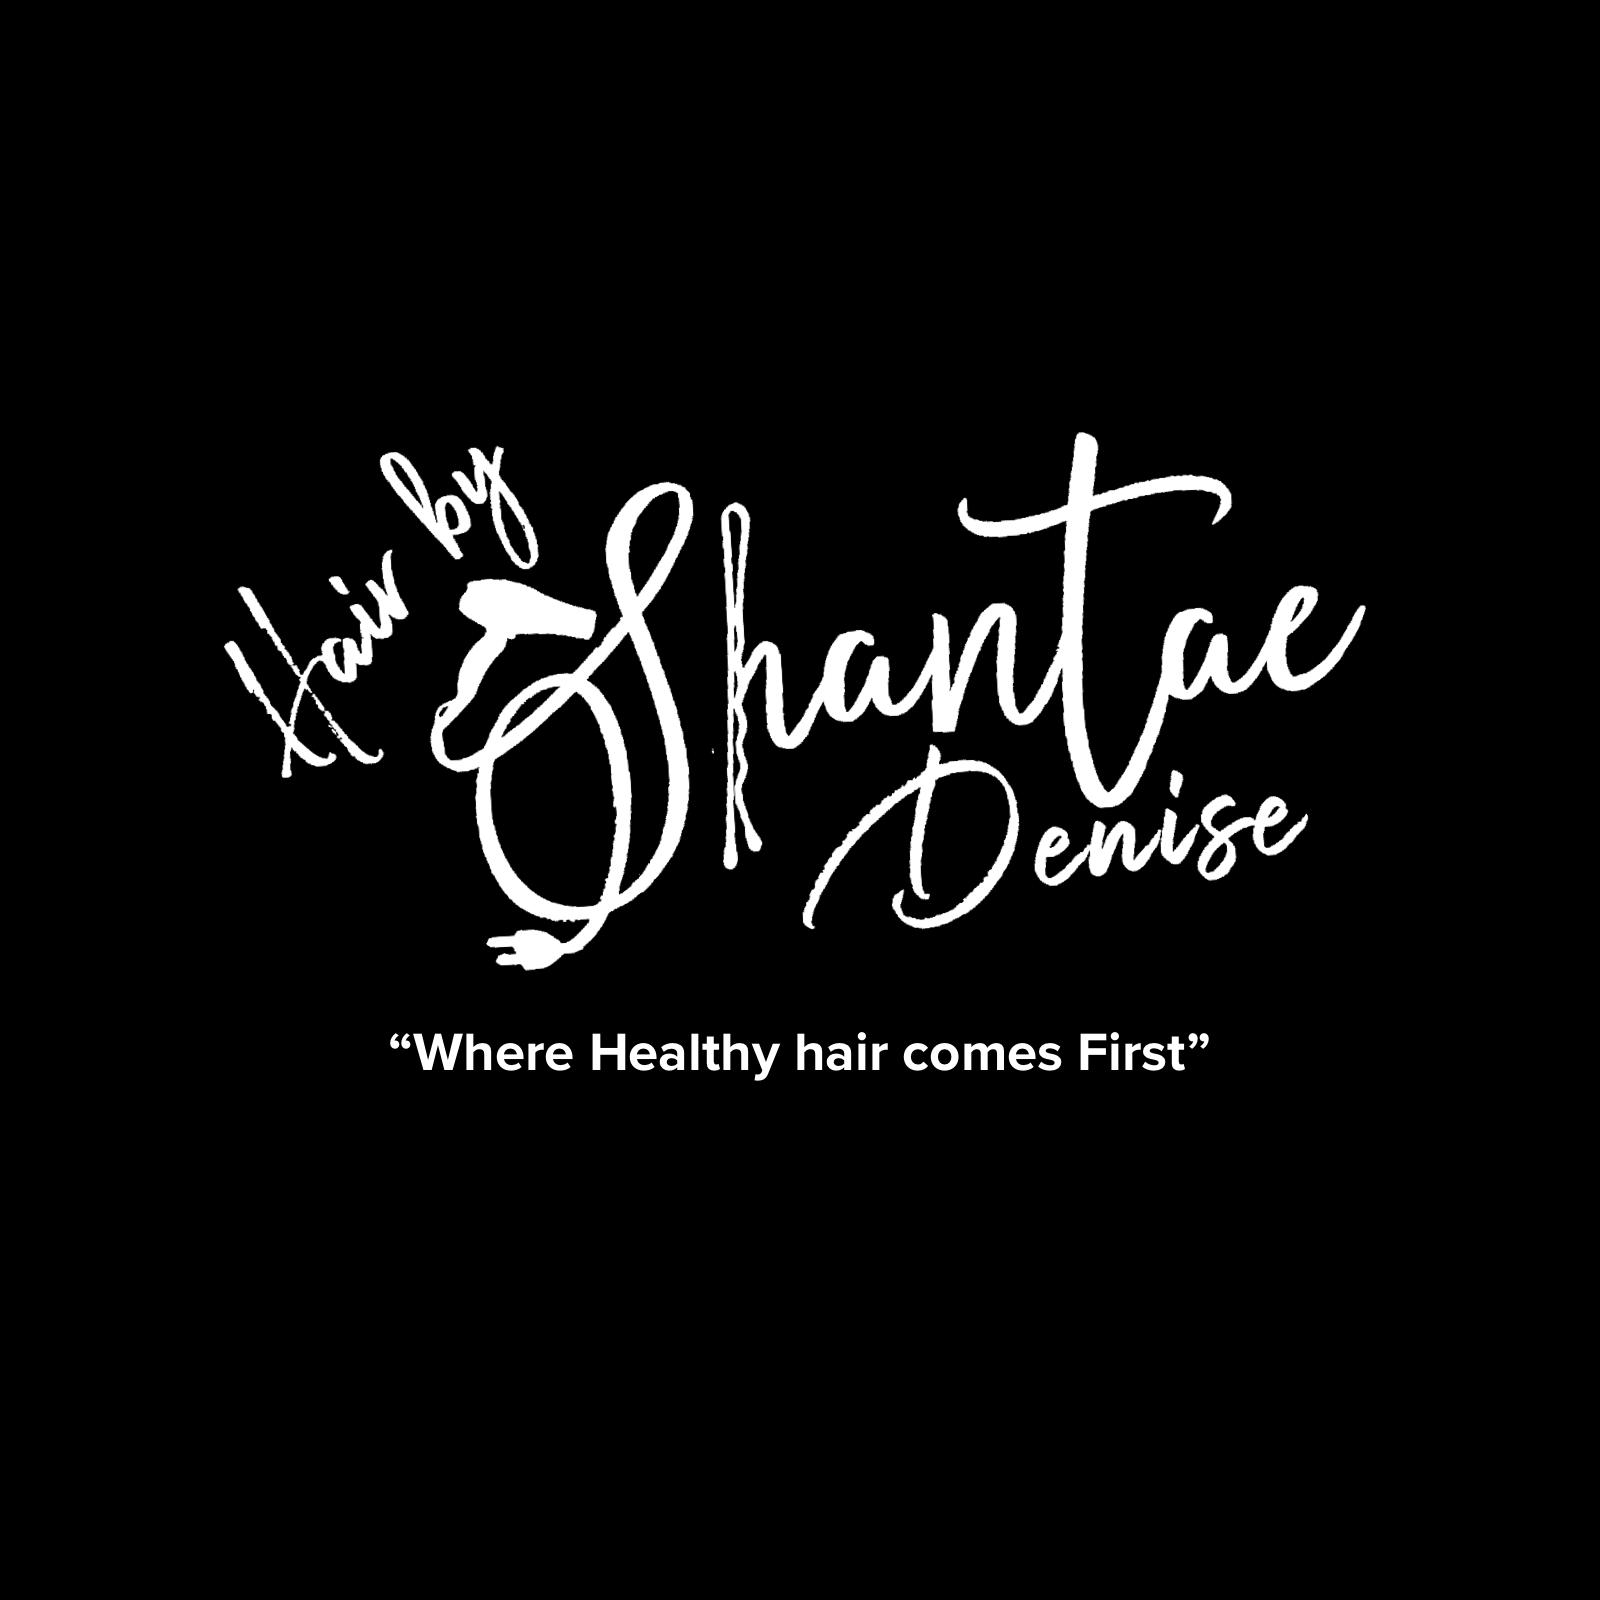 Hair by ShantaeDenise